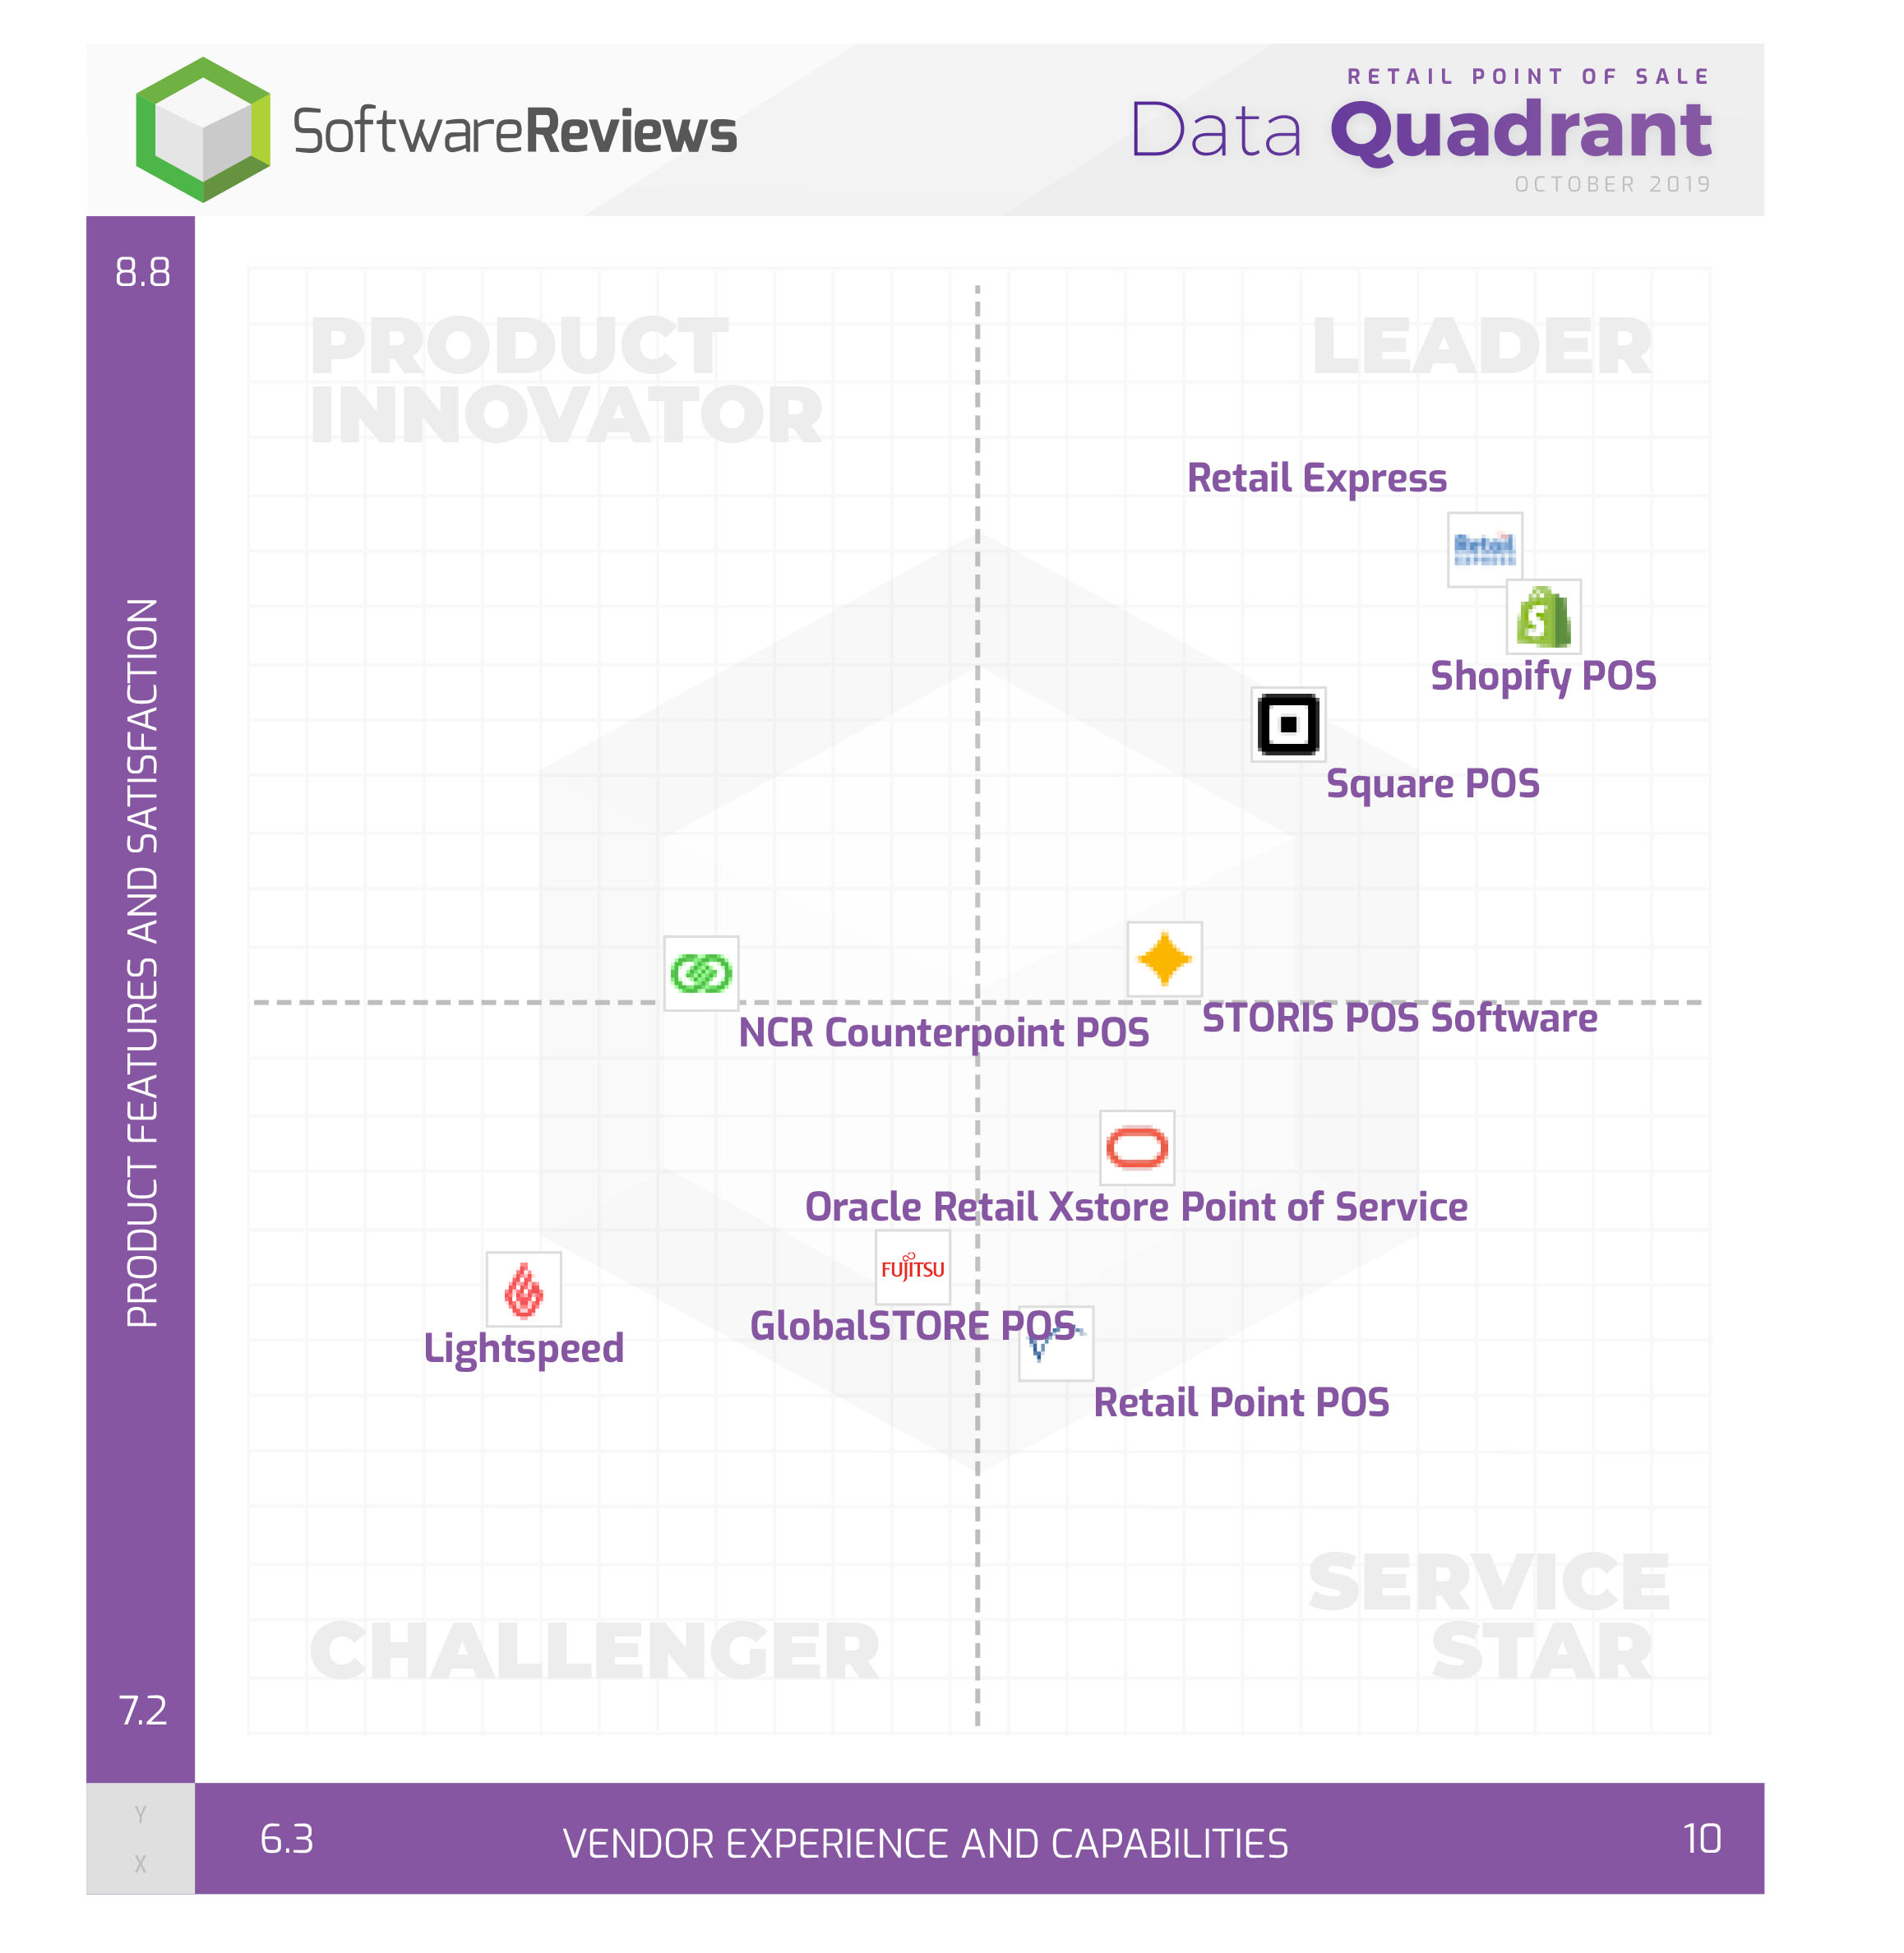 Retail Point of Sale Data Quadrant